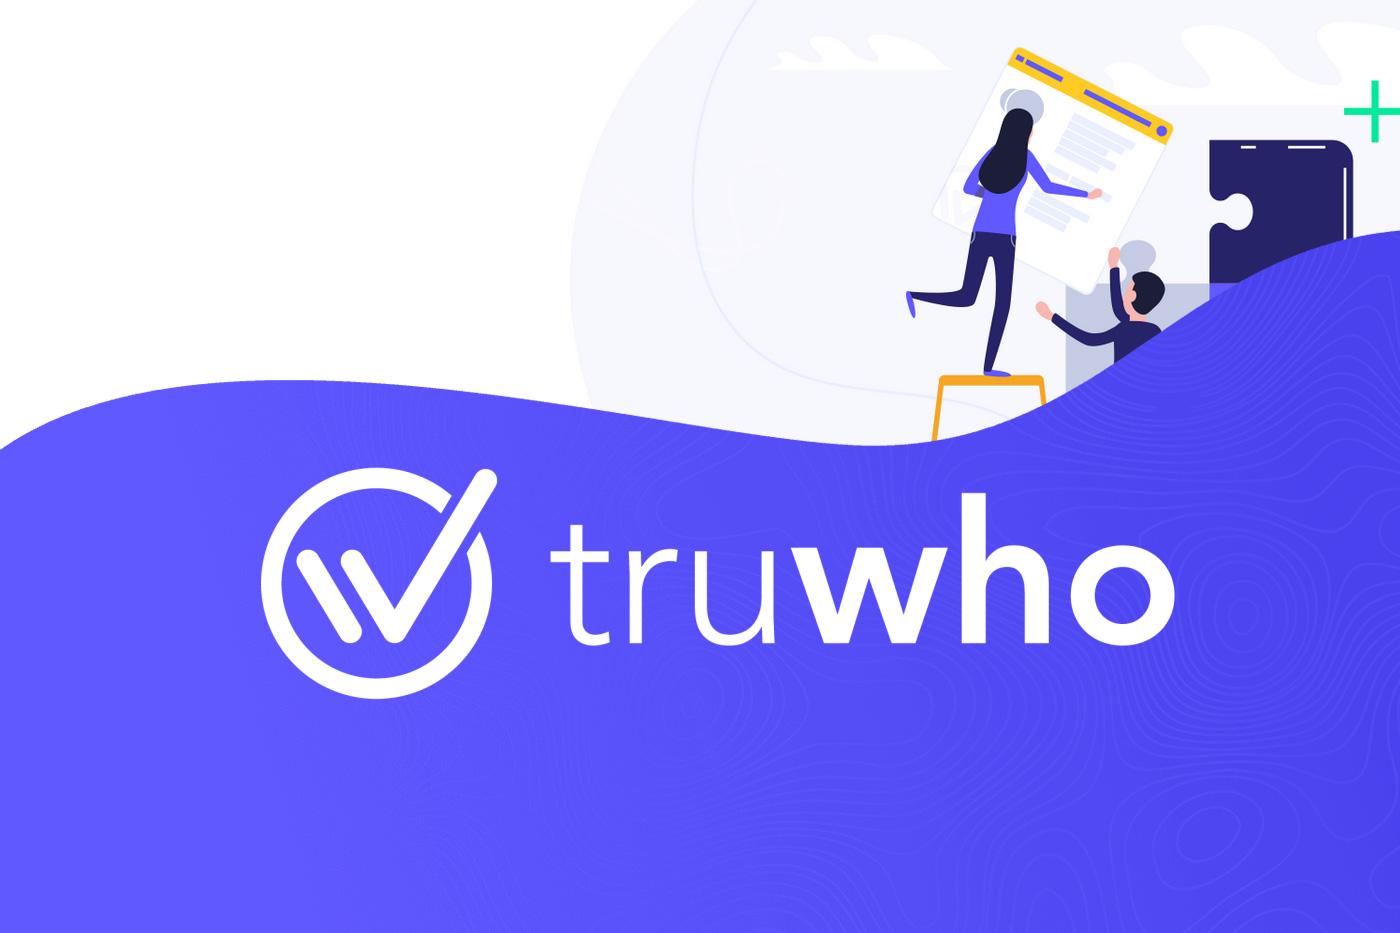 Truwho